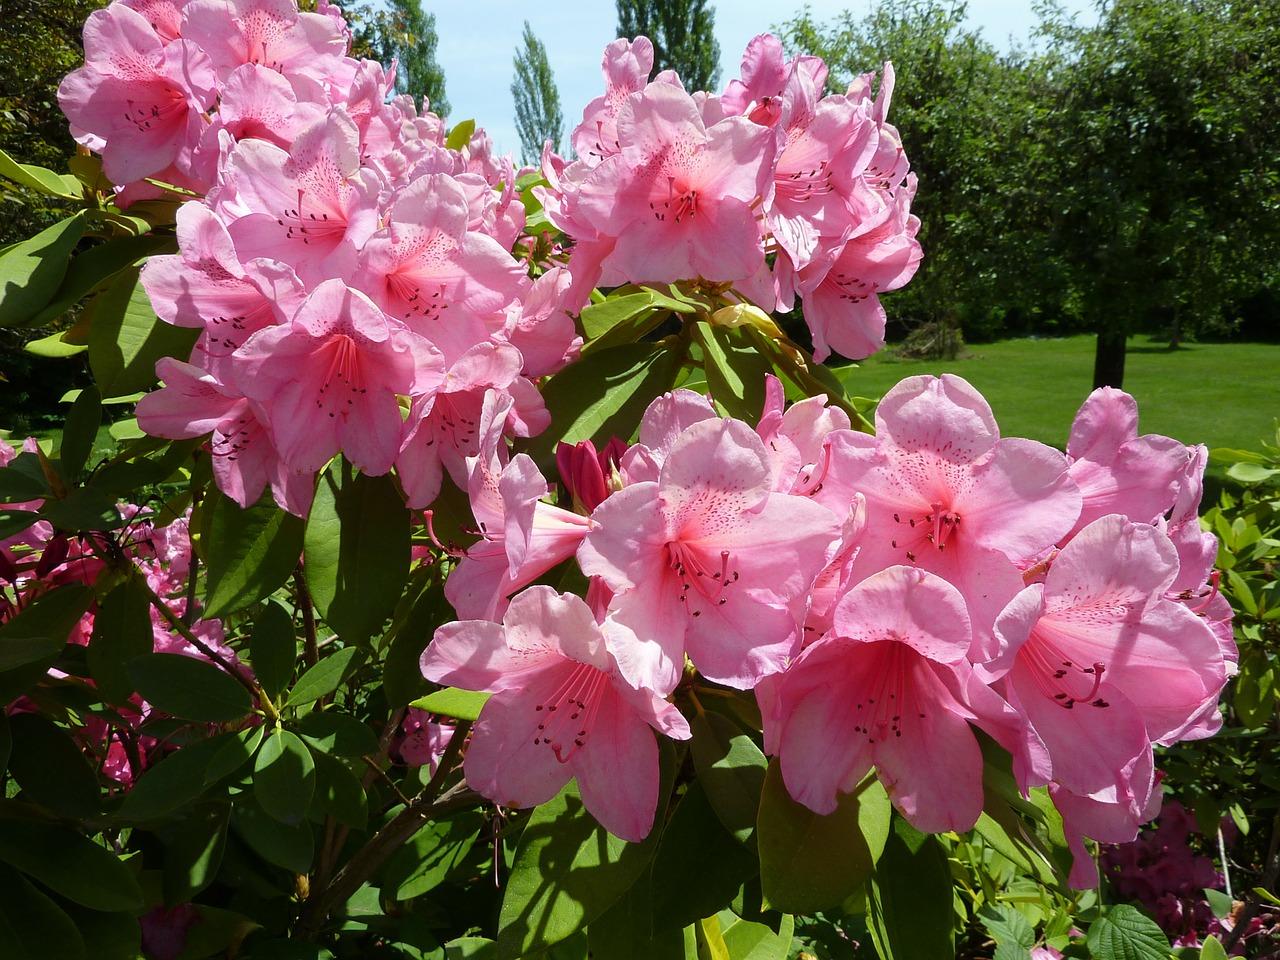 Rhododendronpinkflowerbeautiful flowerblossom free photo from rhododendronpinkflowerbeautiful flowerblossomflowerspink flower izmirmasajfo